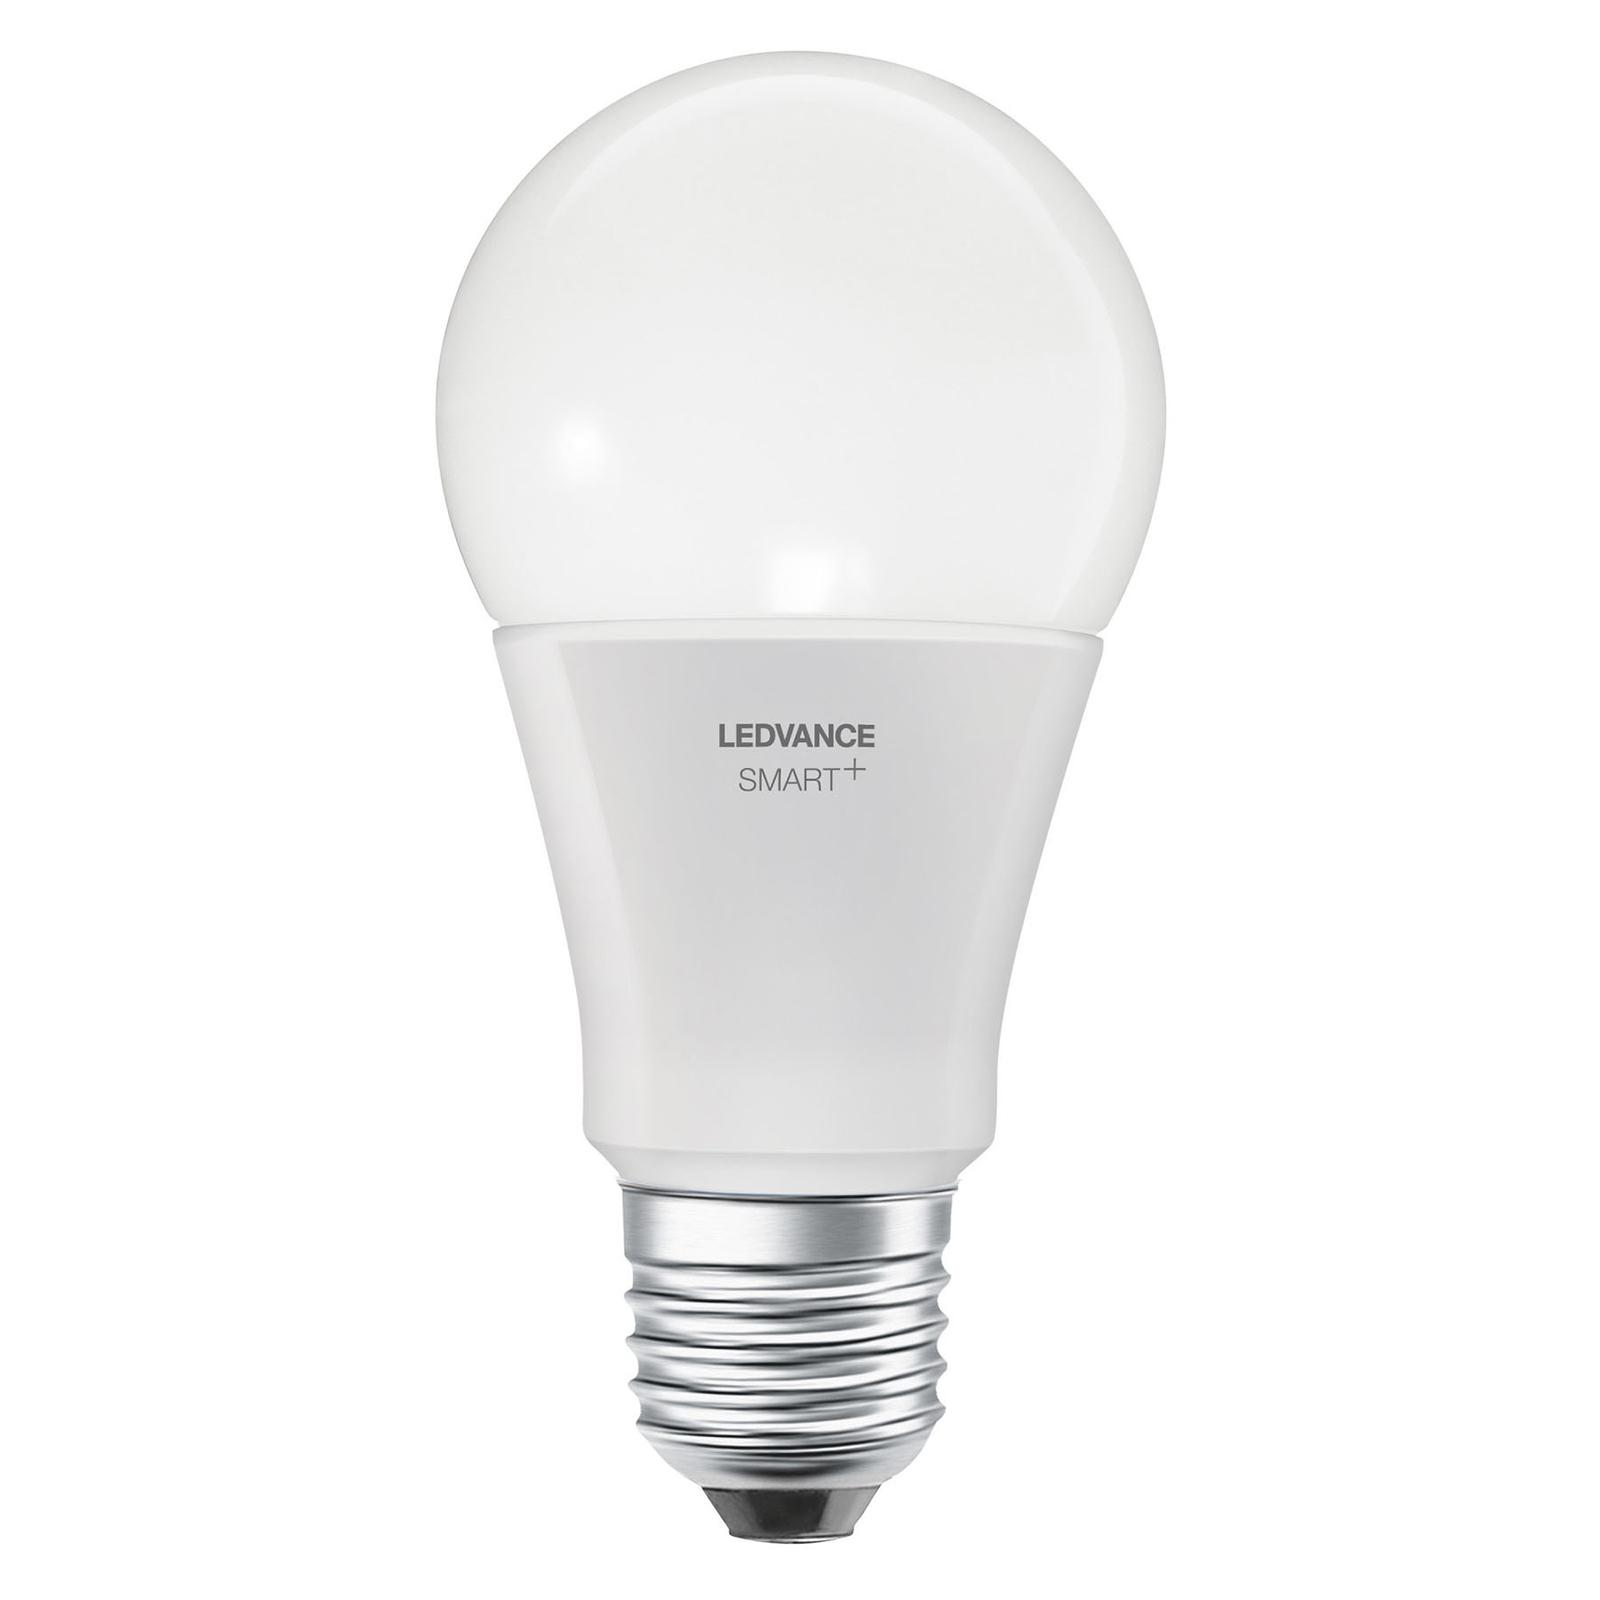 LEDVANCE SMART+ WiFi E27 9W Classic 2700-6500K